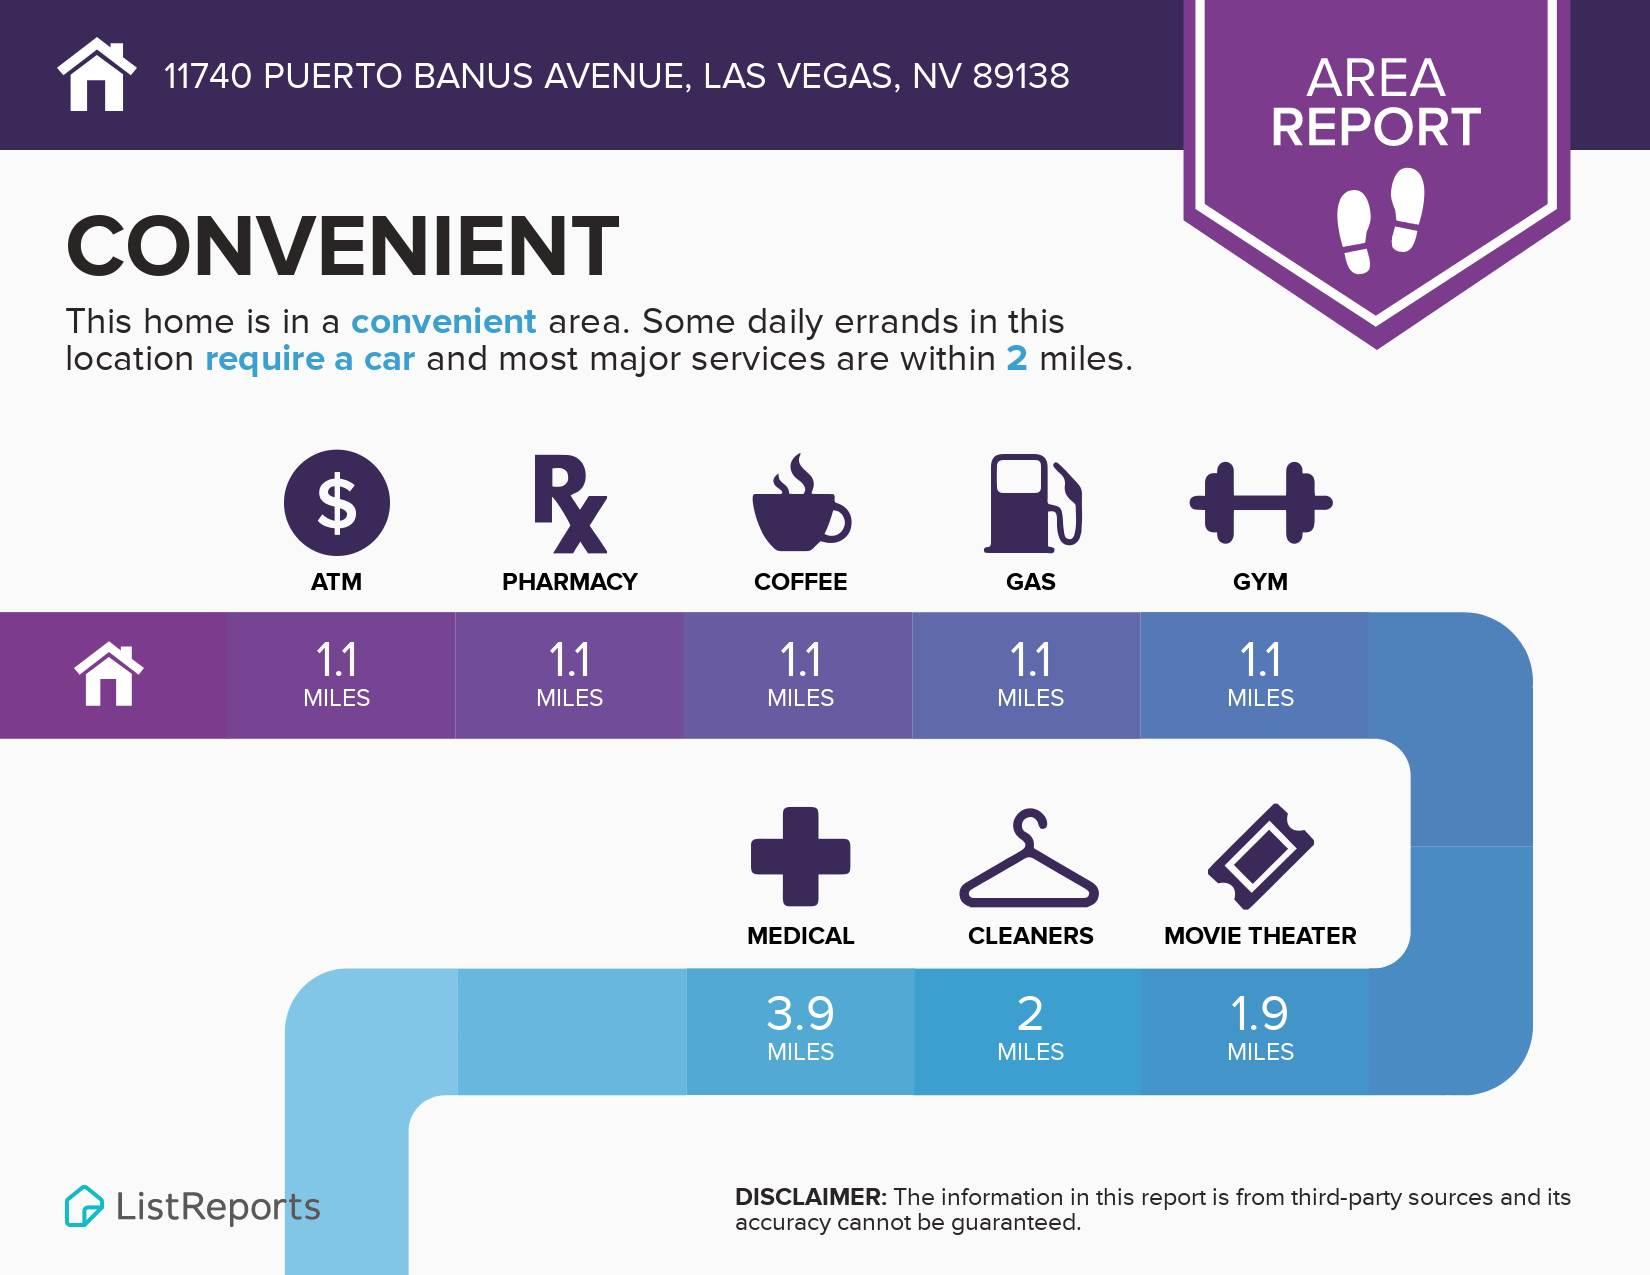 11740 Puerto Banus Avenue, Las Vegas, NV 89138